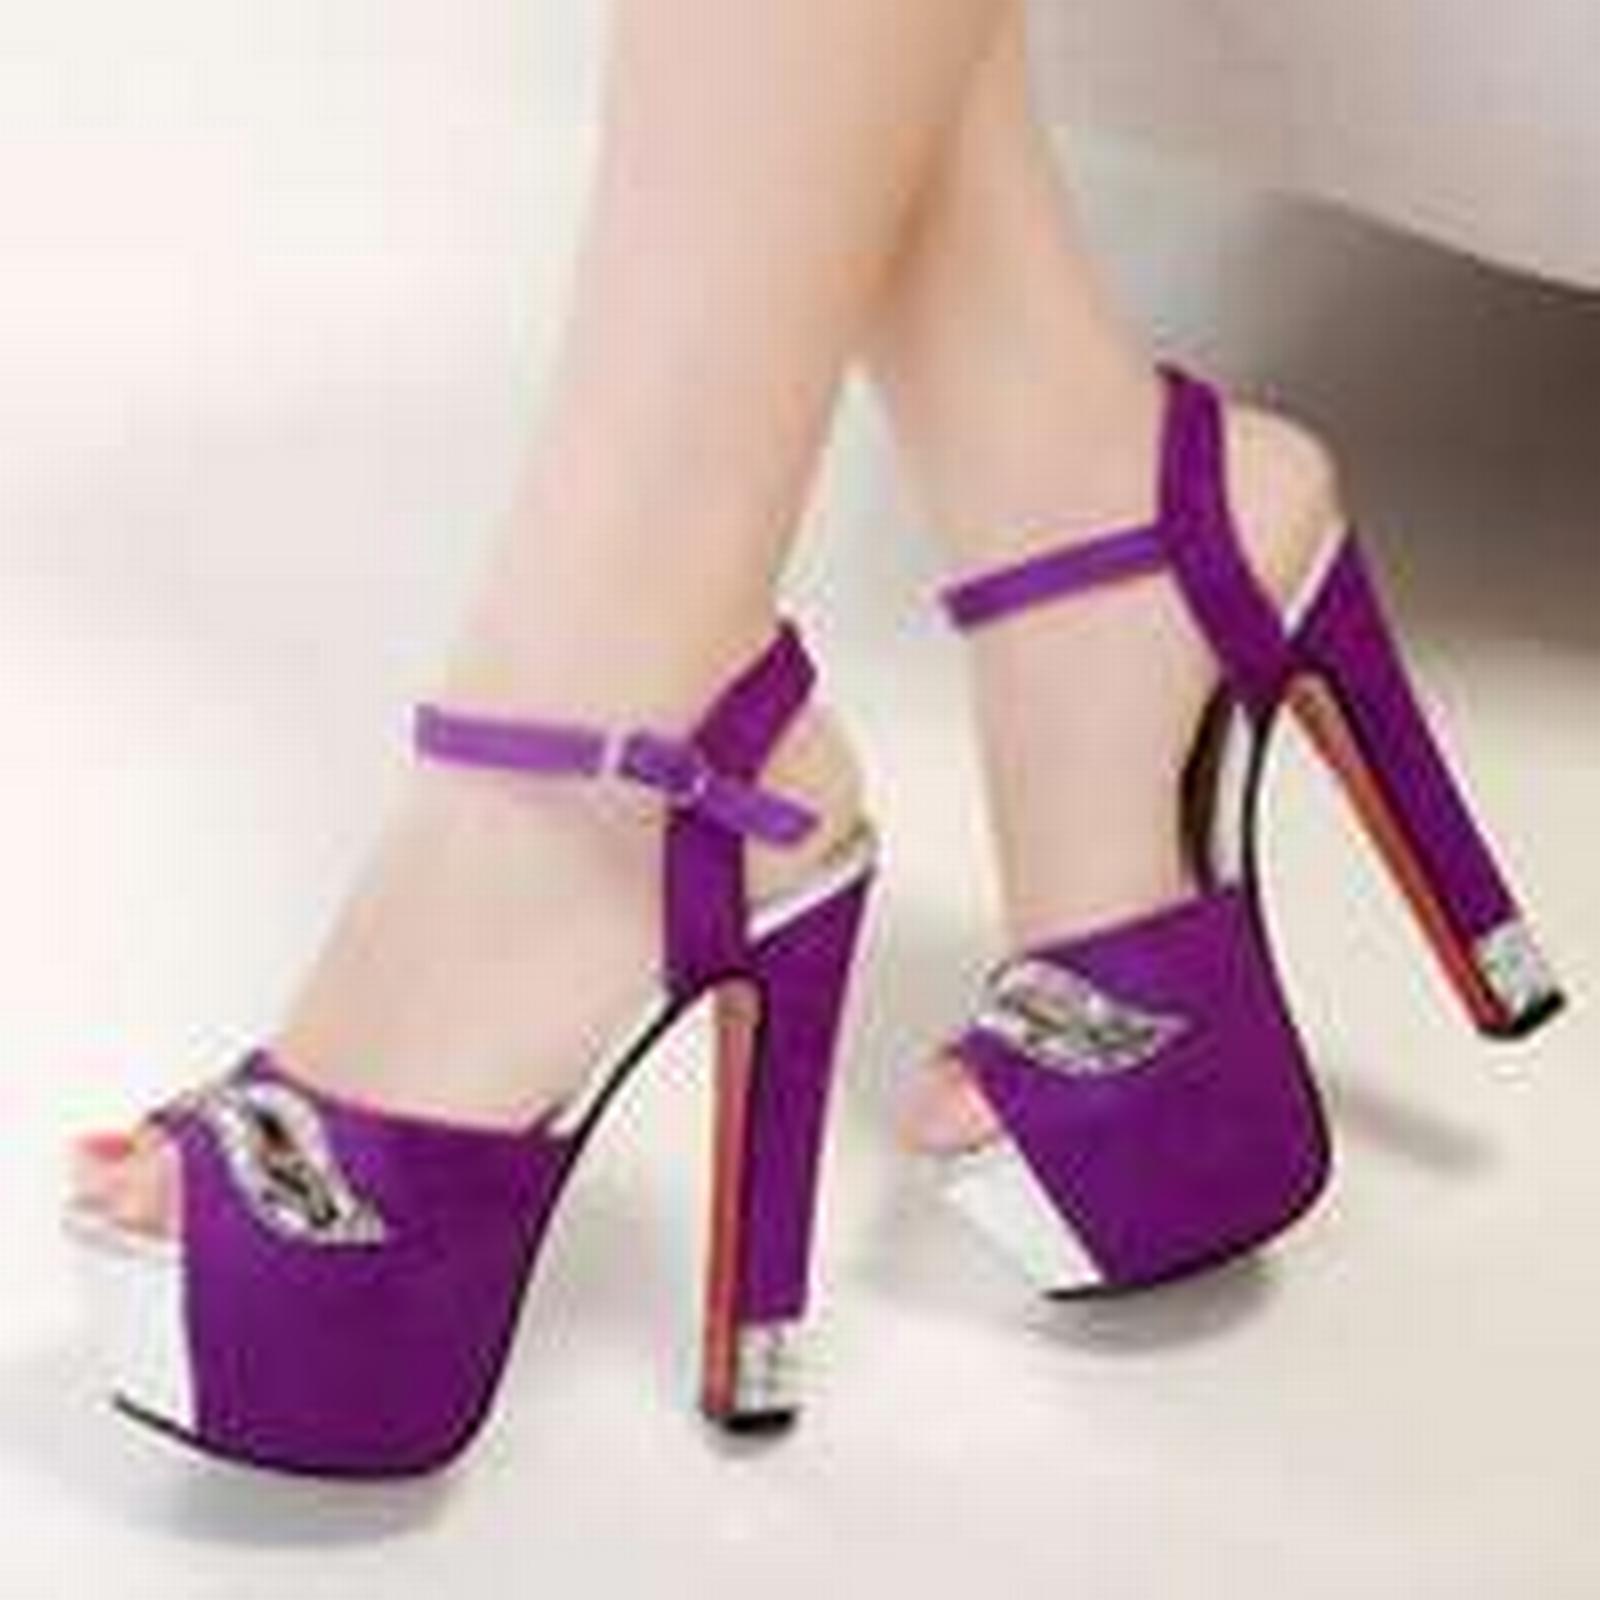 Bonanza (Global) ps332 elegant US rhinestone sandals, suede leather, US elegant Size 4-9, violet c703c7